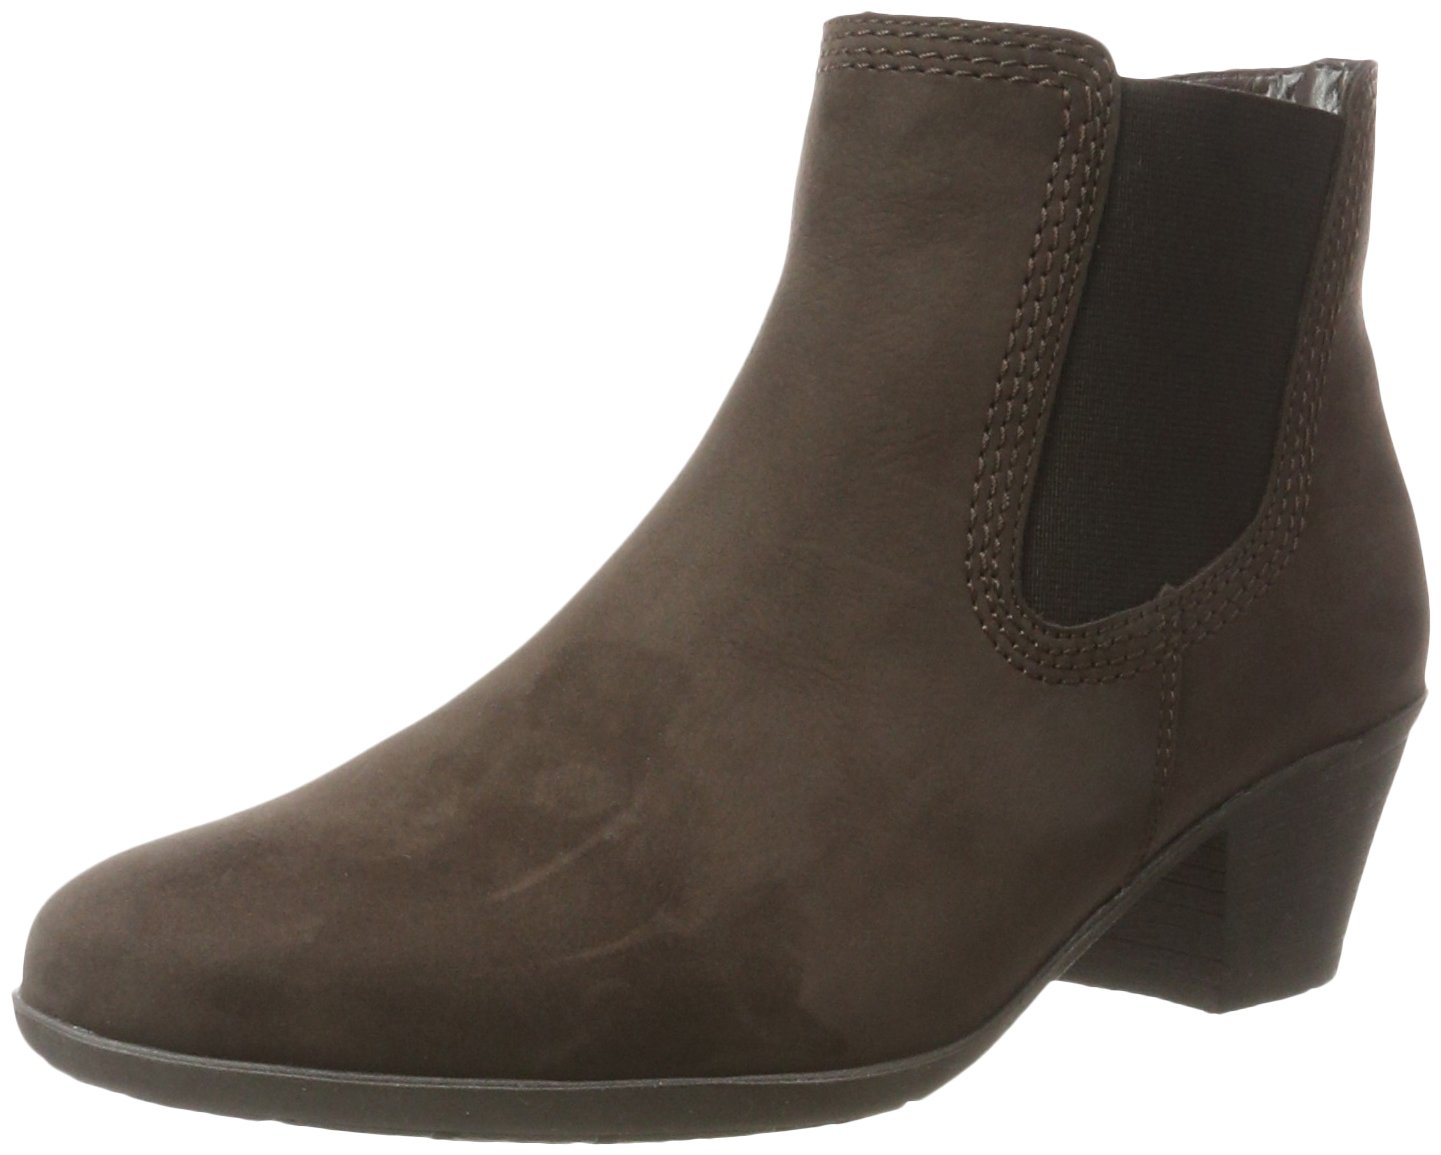 Gabor Shoes Gabor Casual, Botas para Mujer36 EU Marrón (18 Mocca)